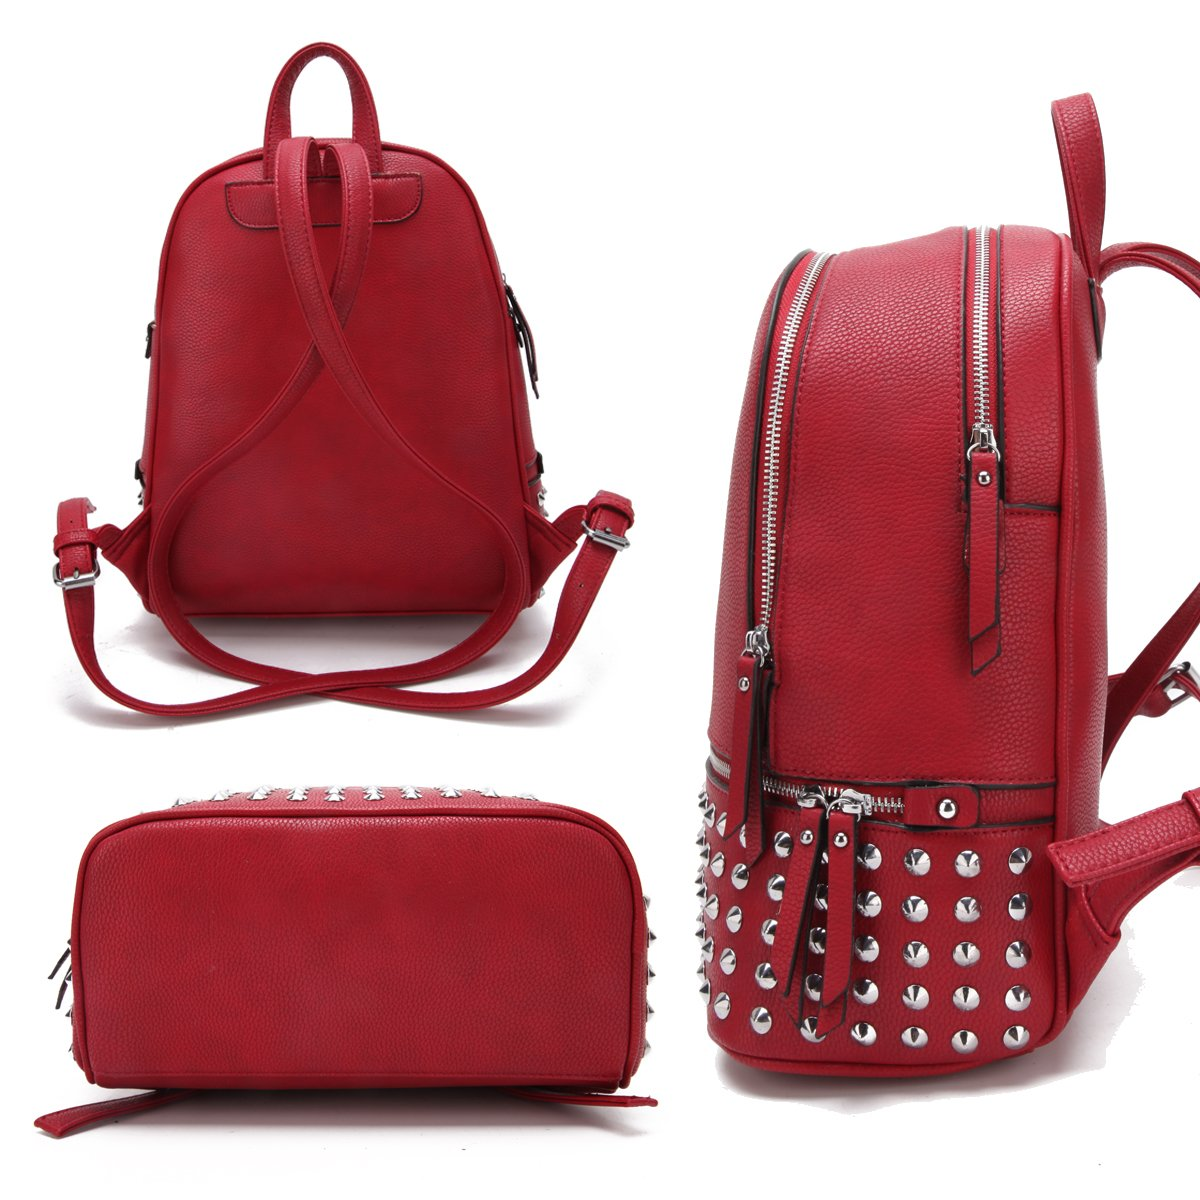 Amazon.com  Dasein Casual Backpack Purse School Bag Vegan Leather Shoulder  Bag Designer Daypack Tote for Womens Girls  Shoes 9030ffc826